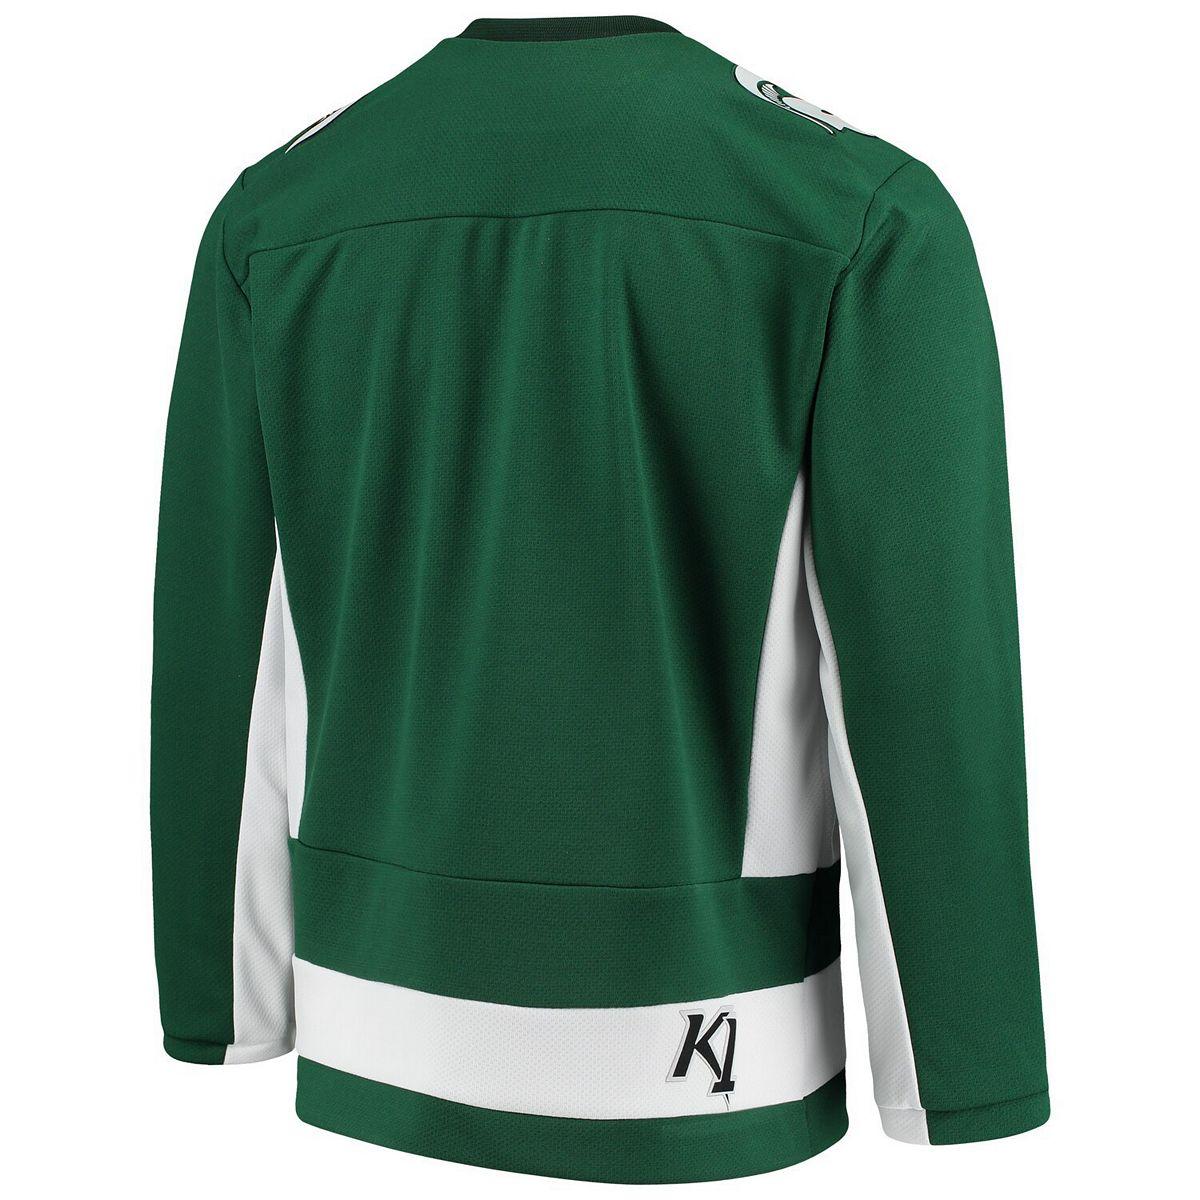 Michigan State Spartans Replica Hockey Jersey - Green pYHLu